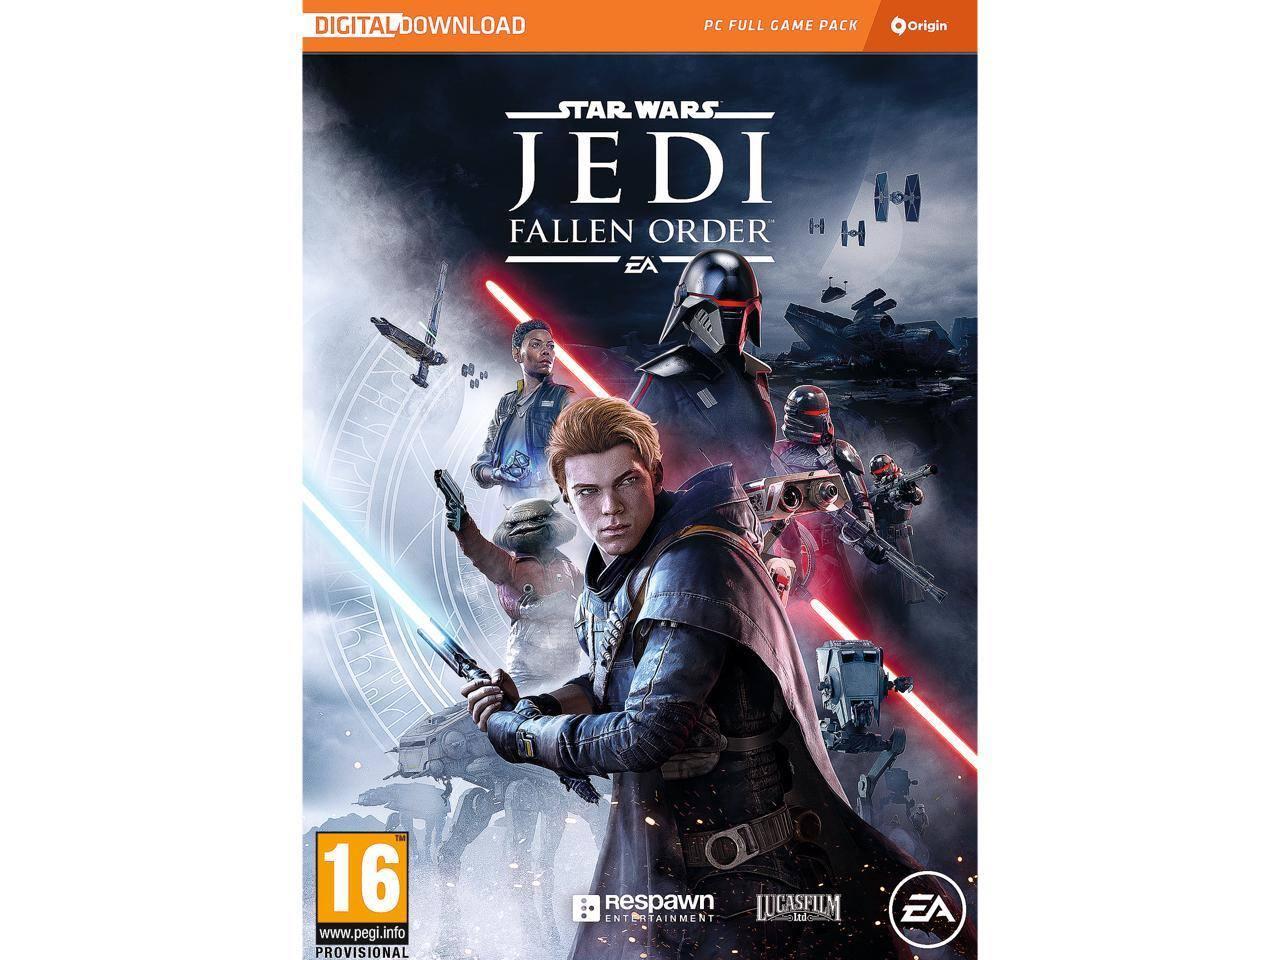 EA PC Digital Games: A Way Out $13.50, Star Wars Jedi: Fallen Order